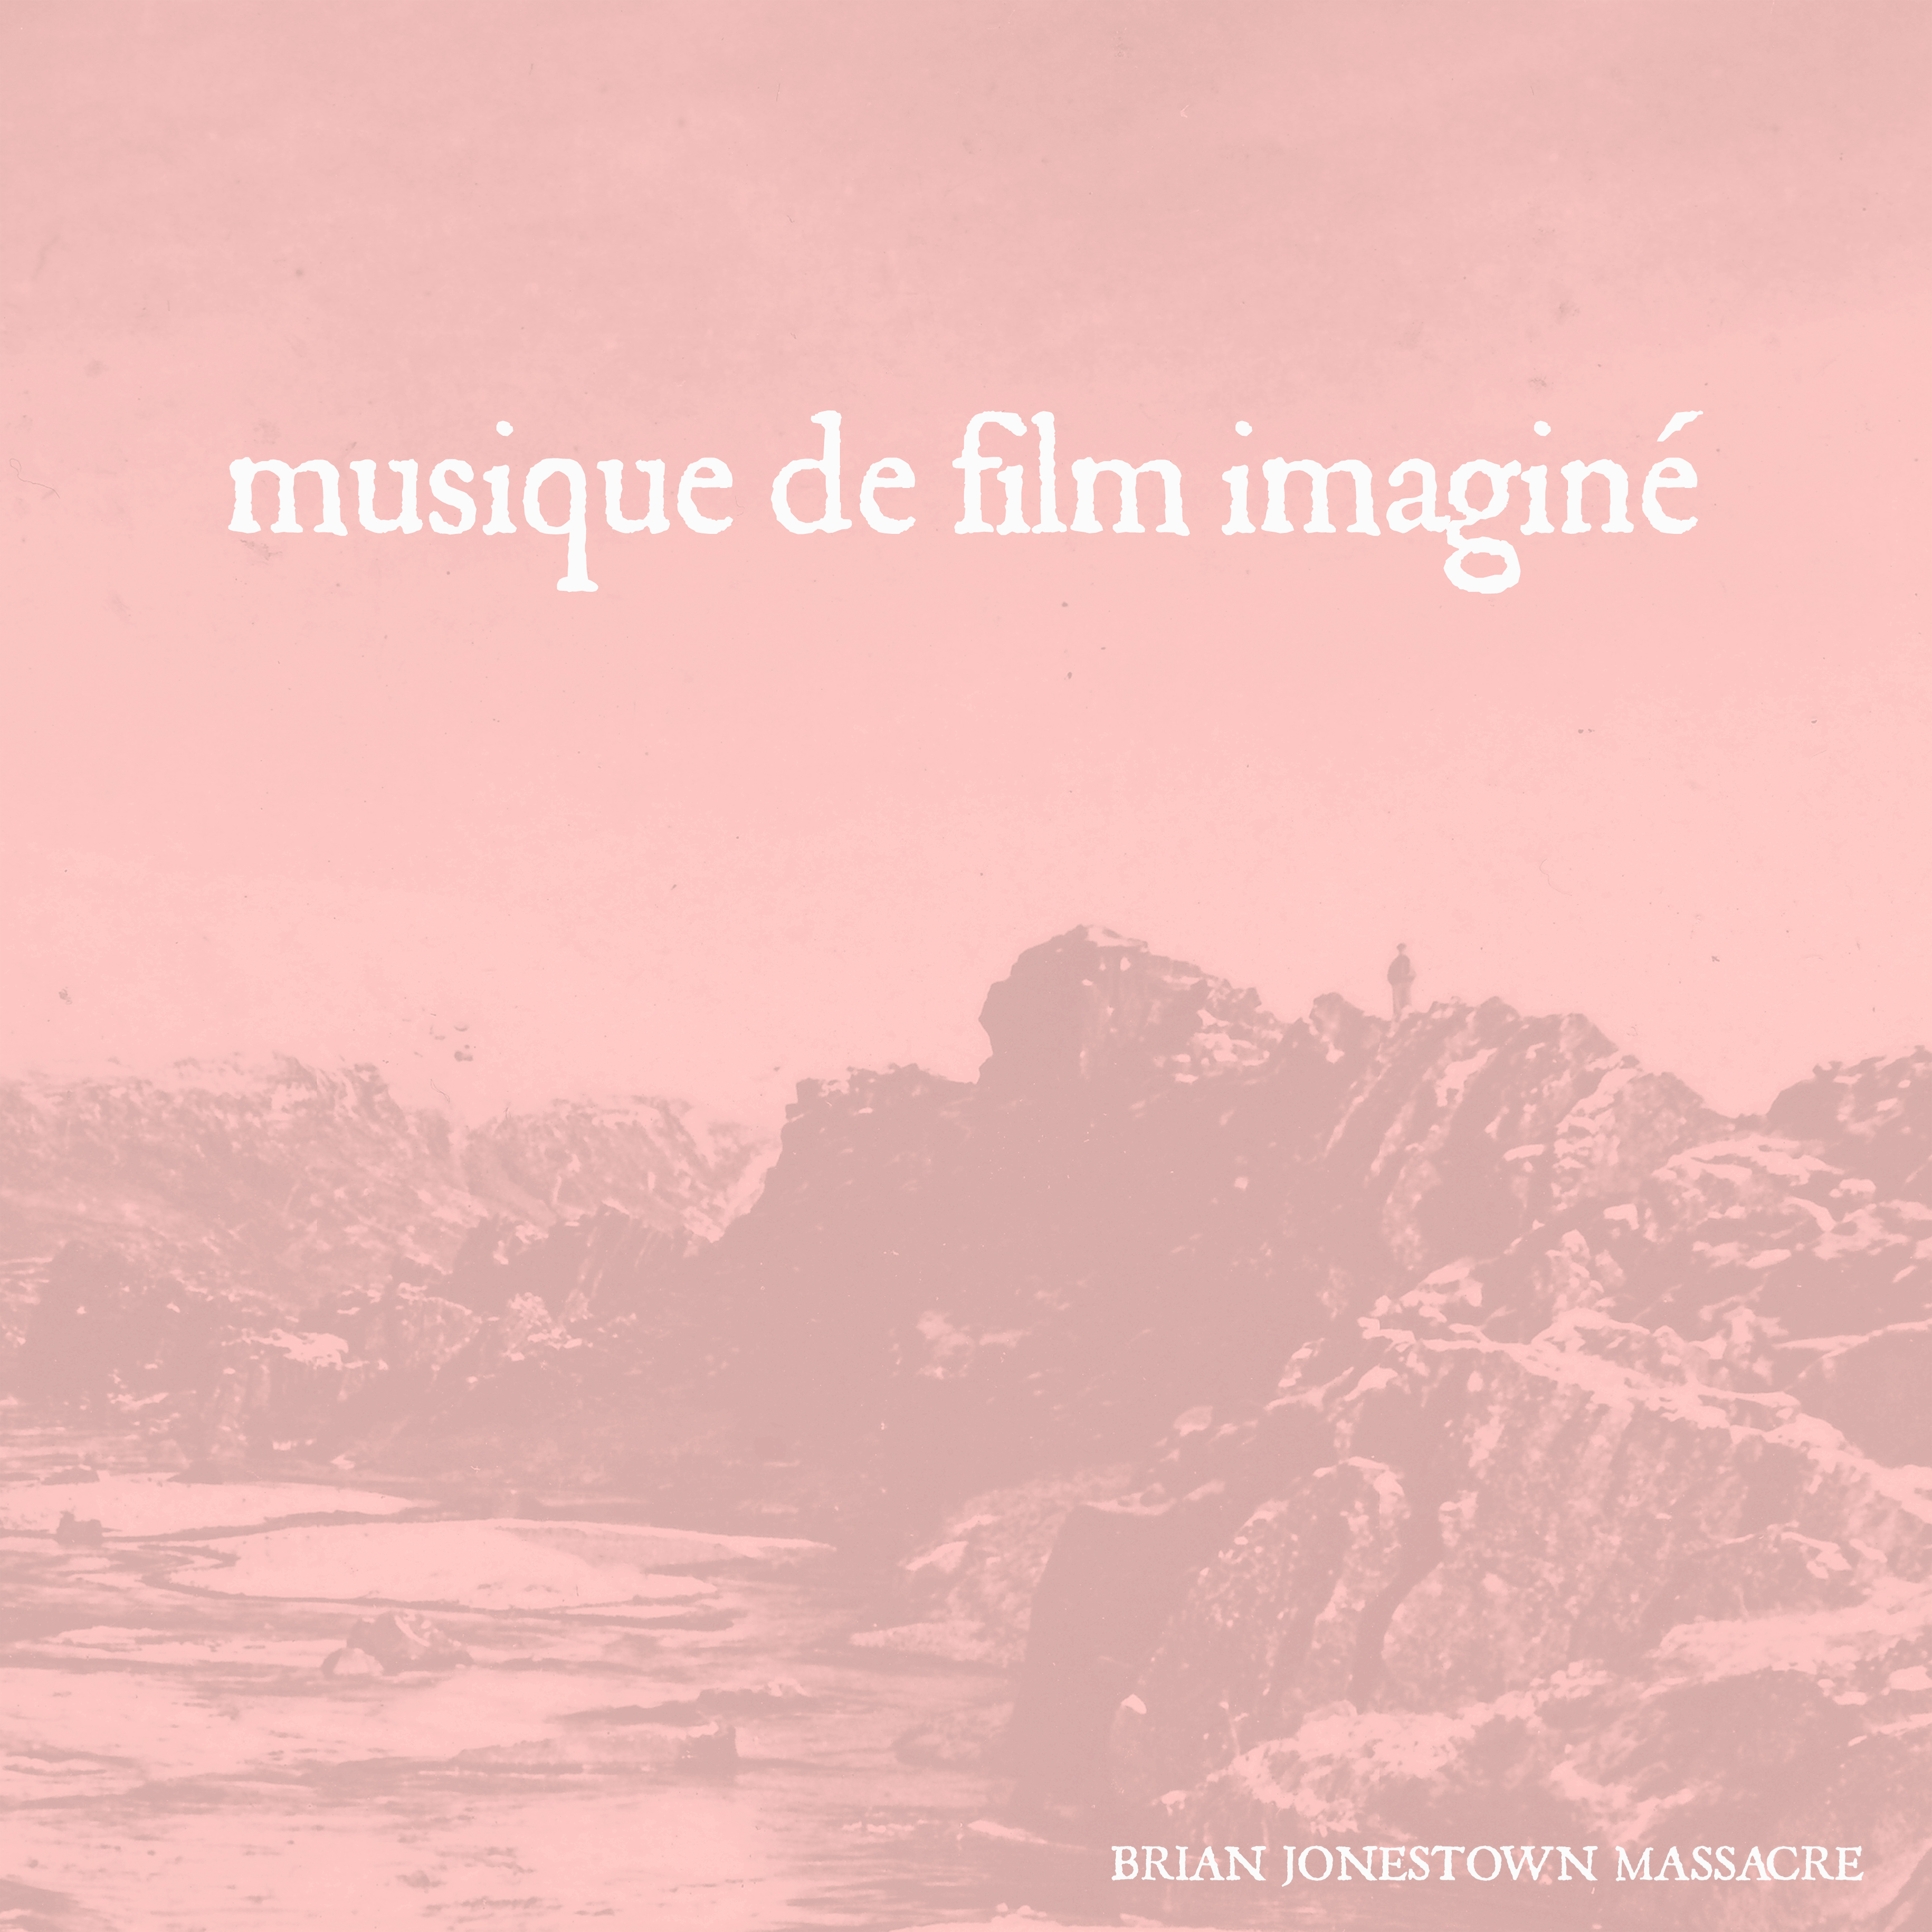 BRIAN JONESTOWN MASSACRE Musique Du Film AUK032